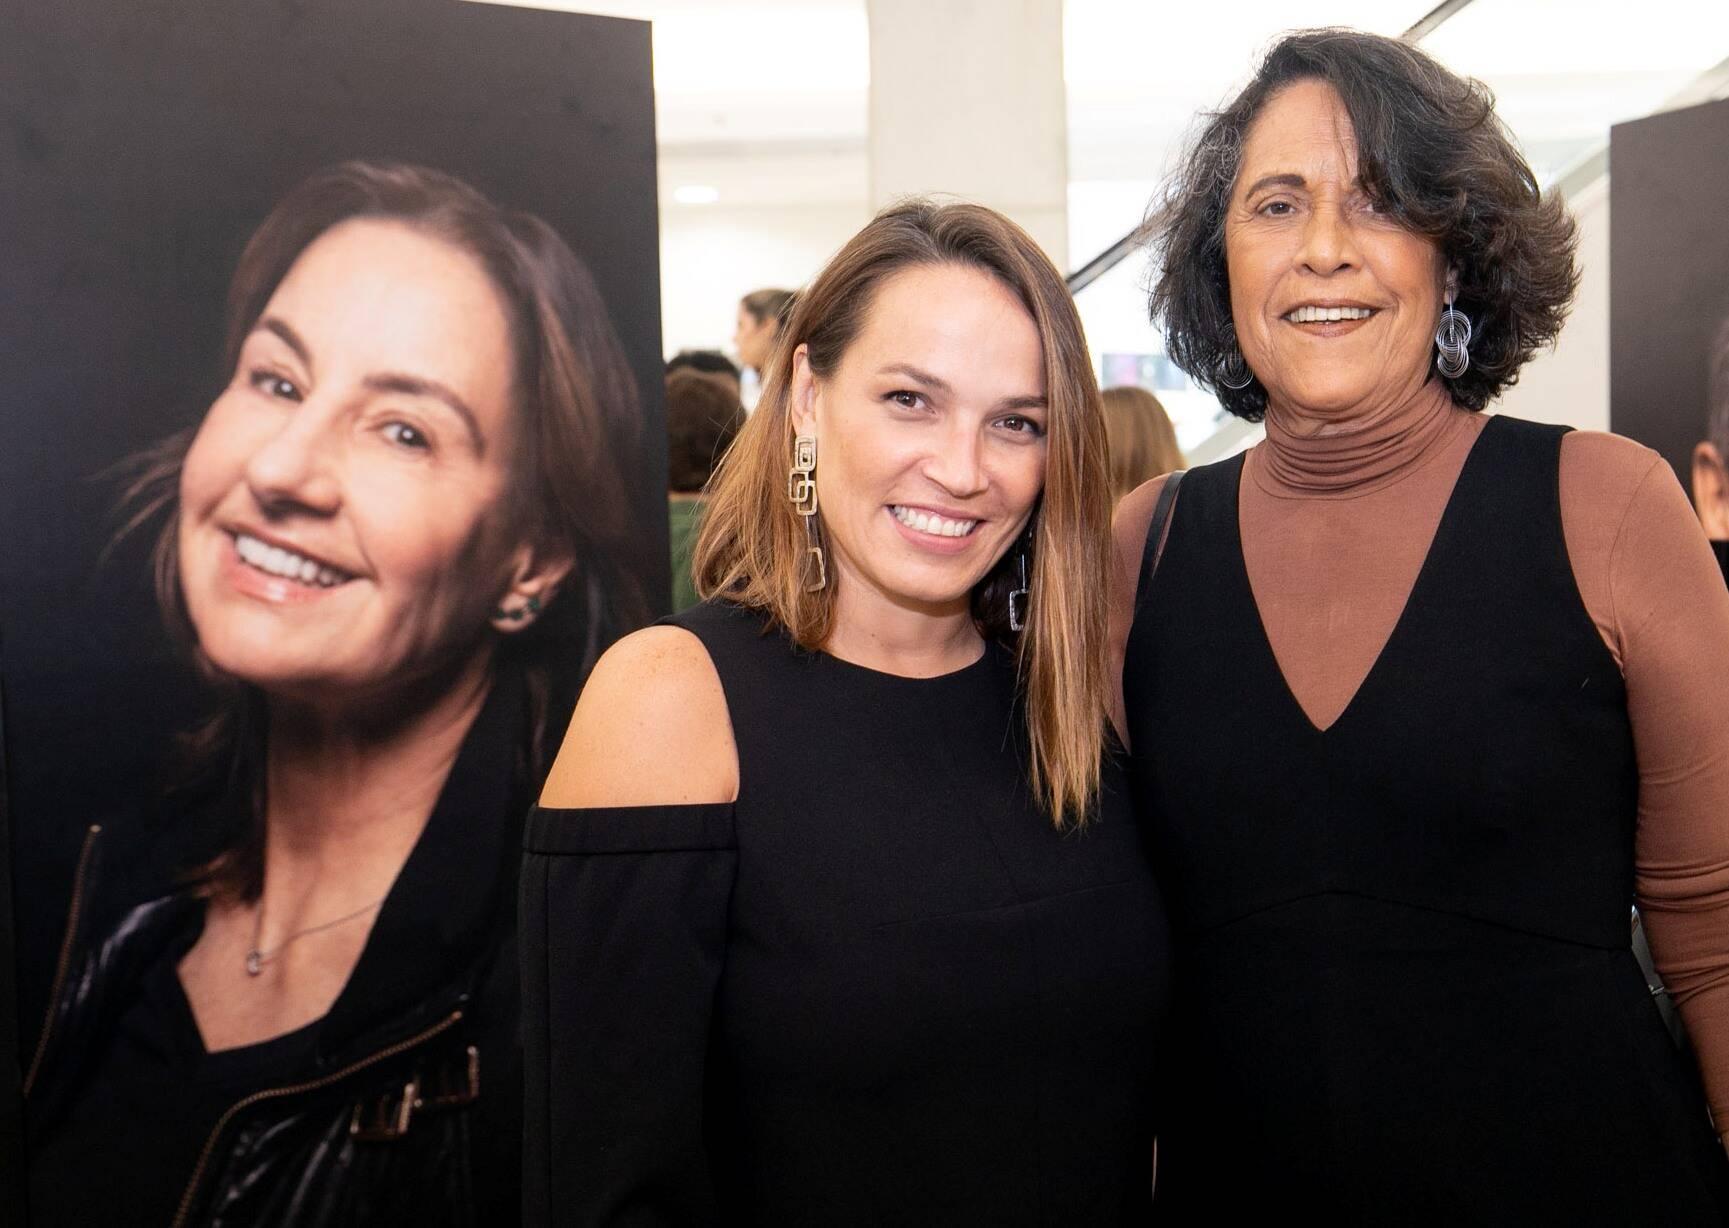 Marina Caruso e madrasta Eliana Caruso ao lado da foto de Ana Carolina Gayoso /  Fot6o: Miguel  Sá